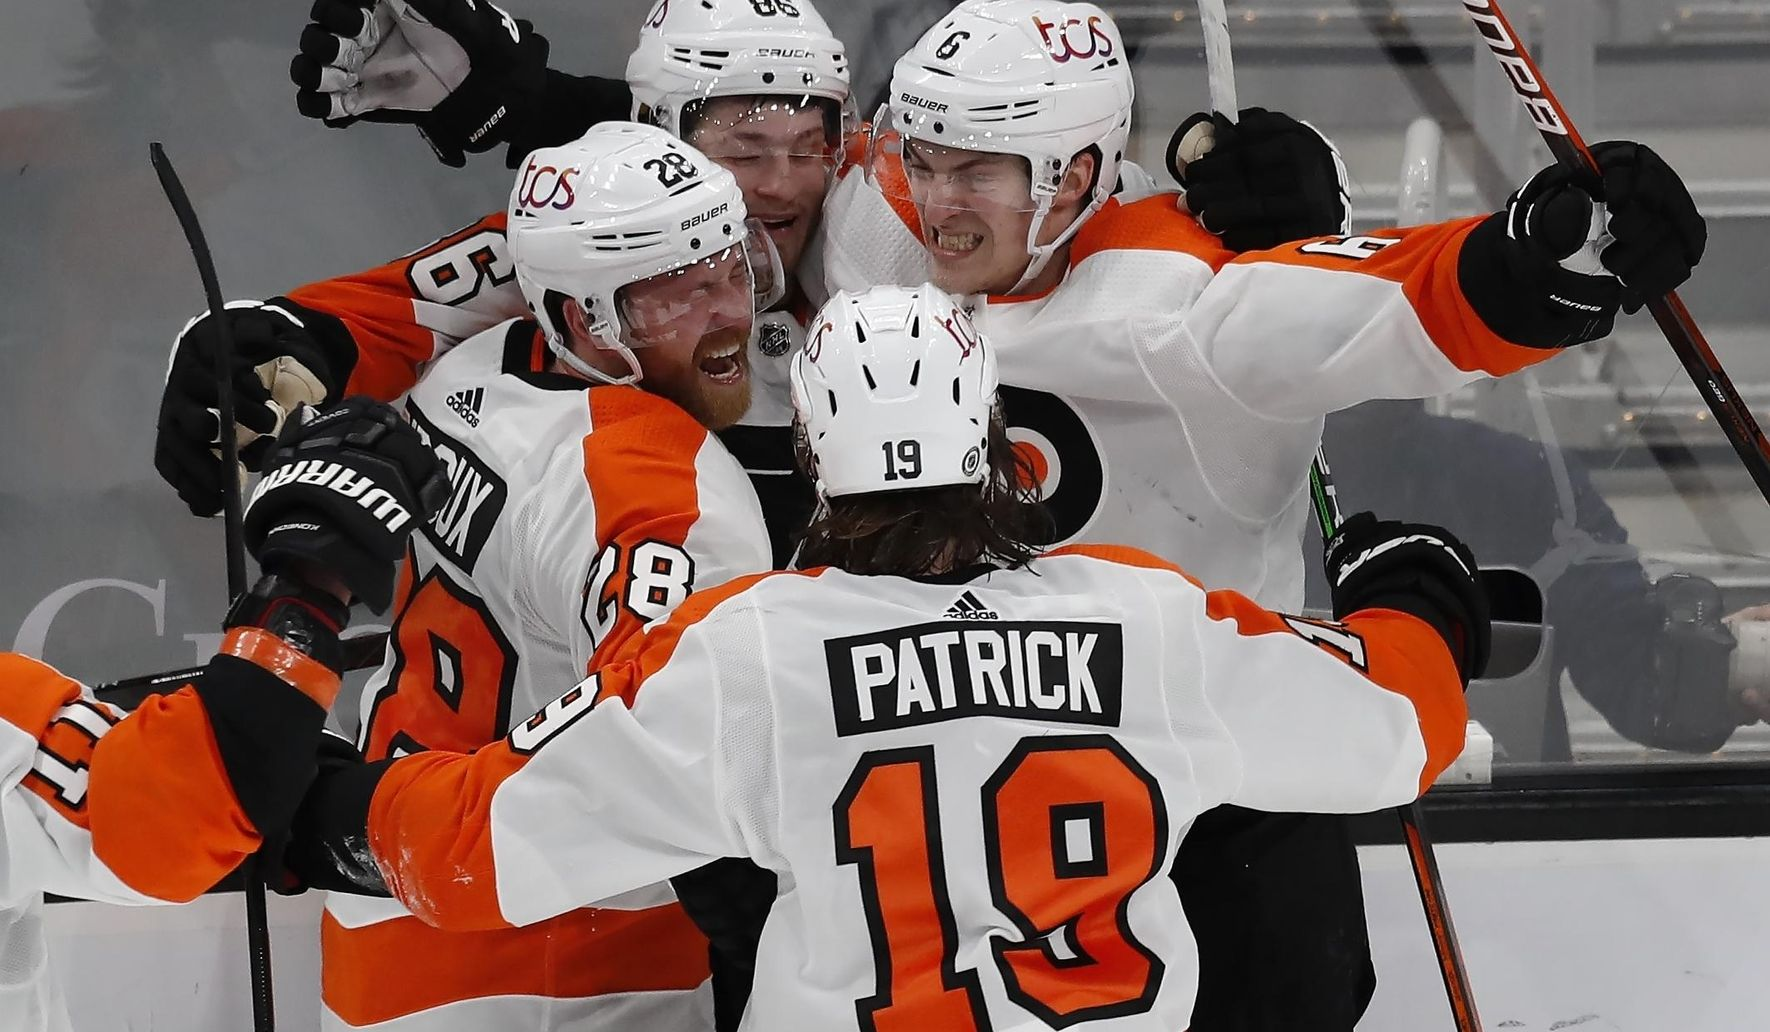 Sanheim scores in OT as Flyers beat Bruins 3-2